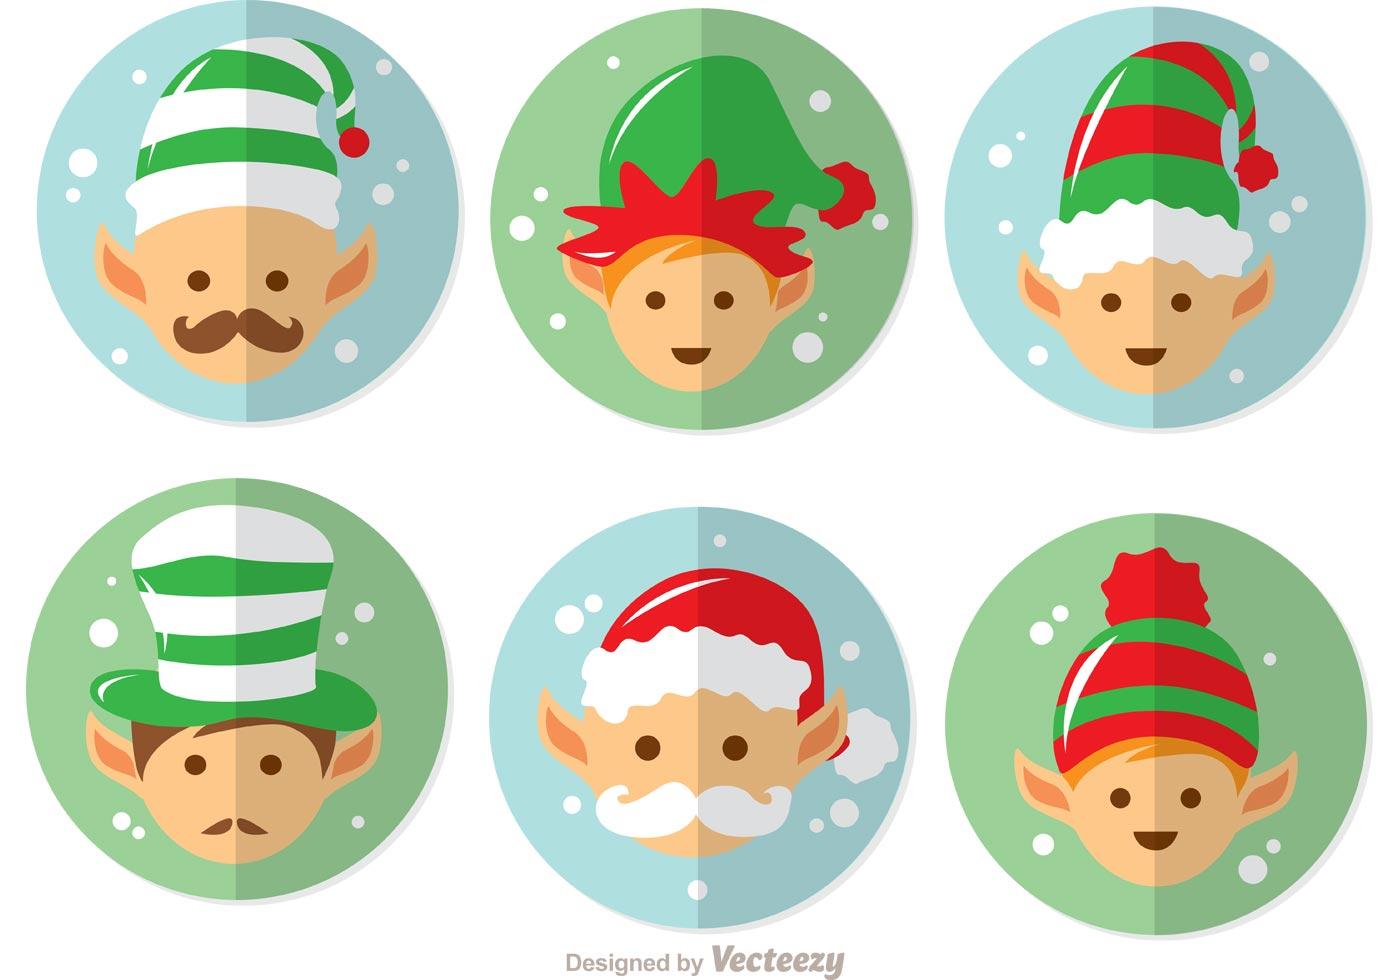 Cartoon Santas Elves Vector Pack - Download Free Vector Art, Stock ...